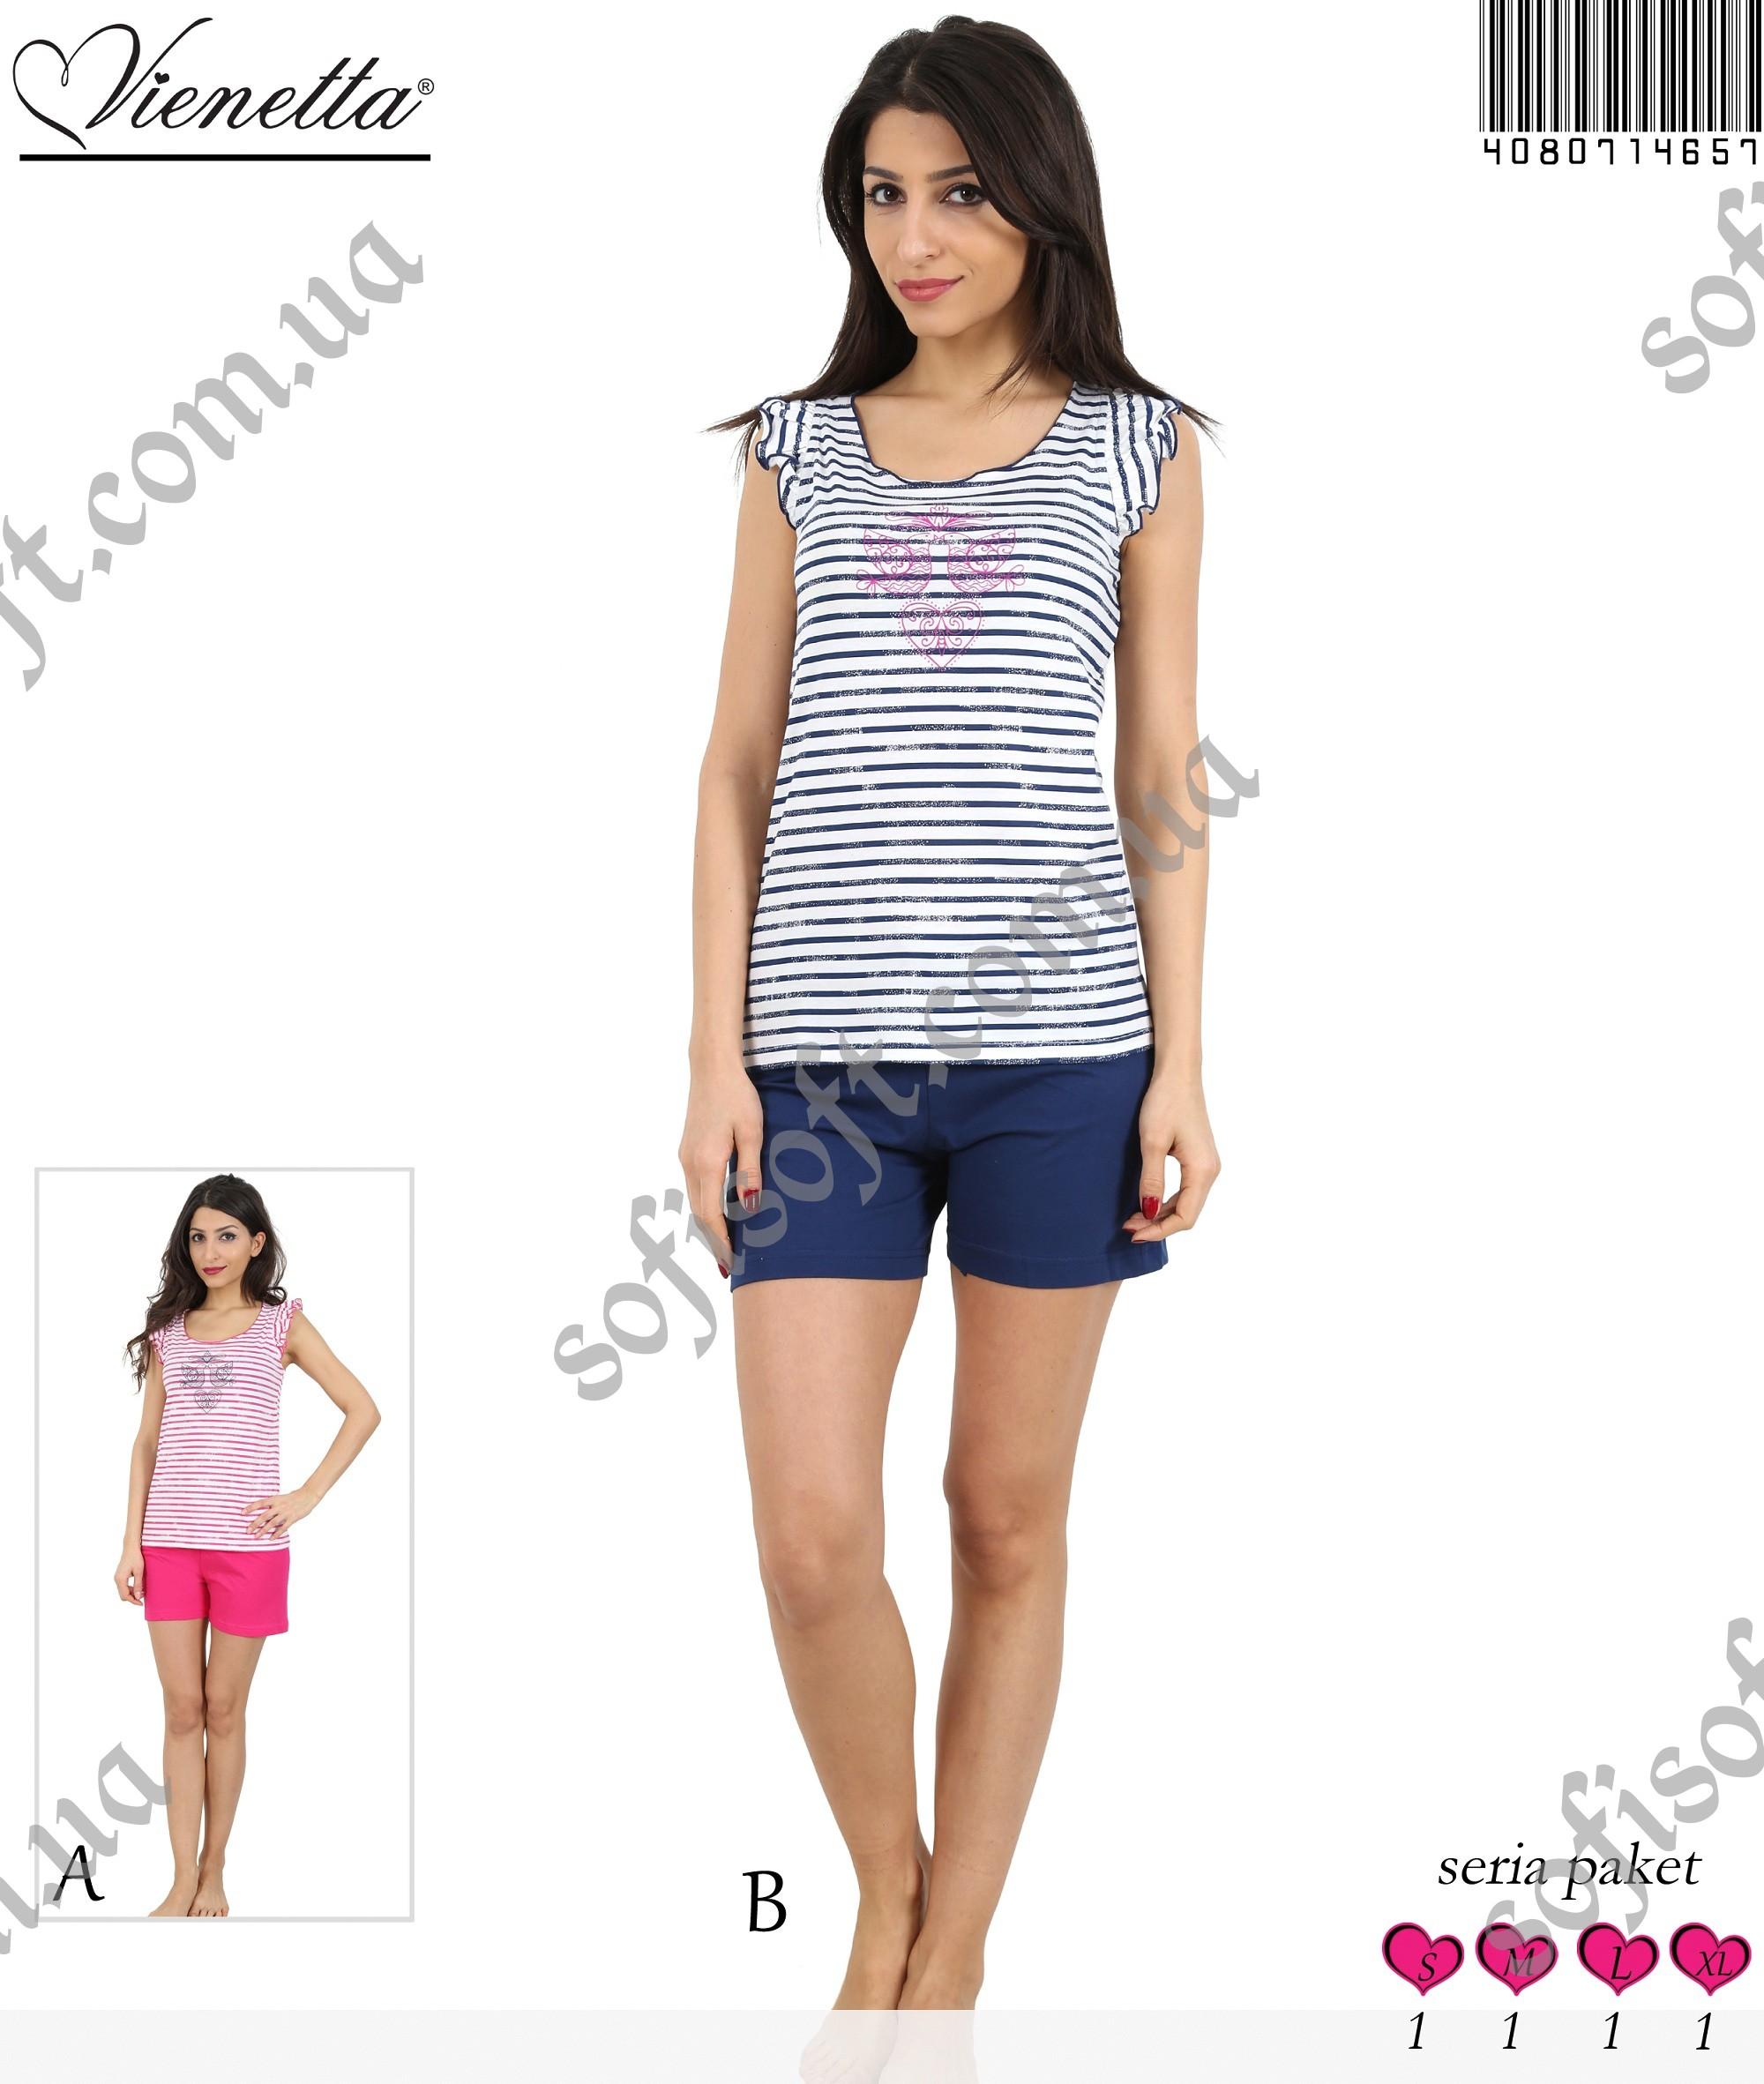 Пижама женская шорты 4080714657